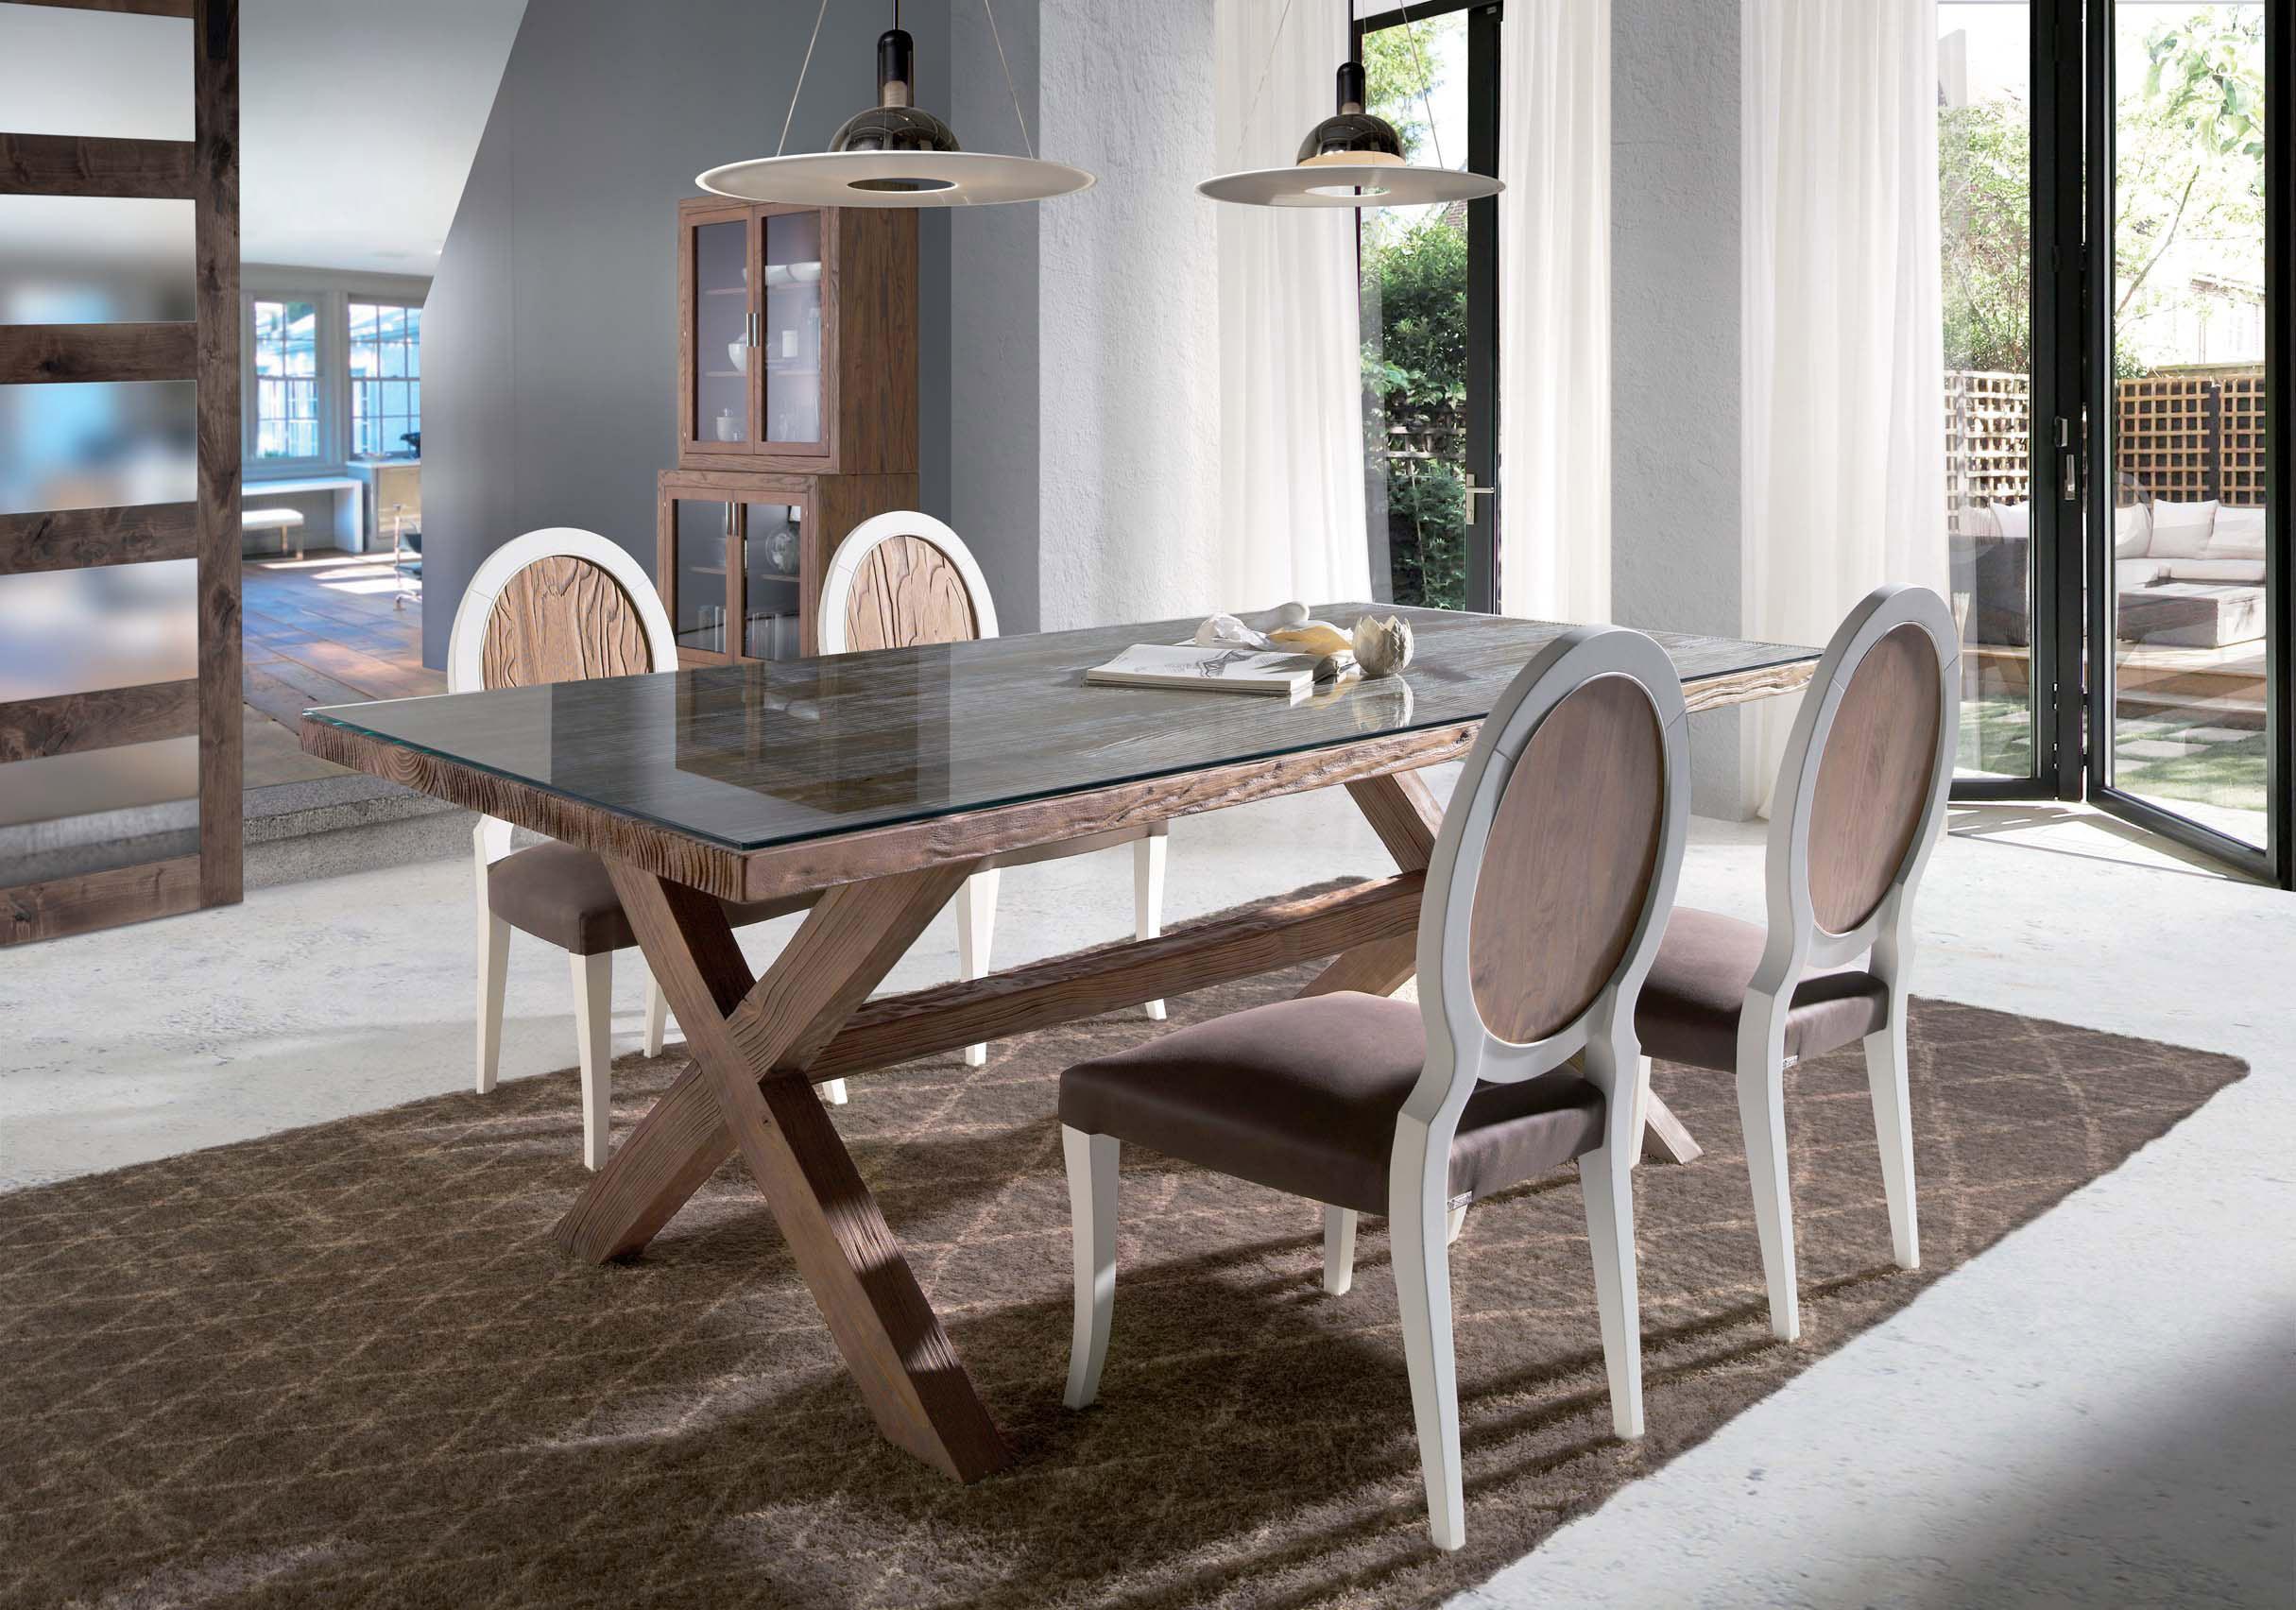 Mesas comedor con aire rstico Villalba Interiorismo